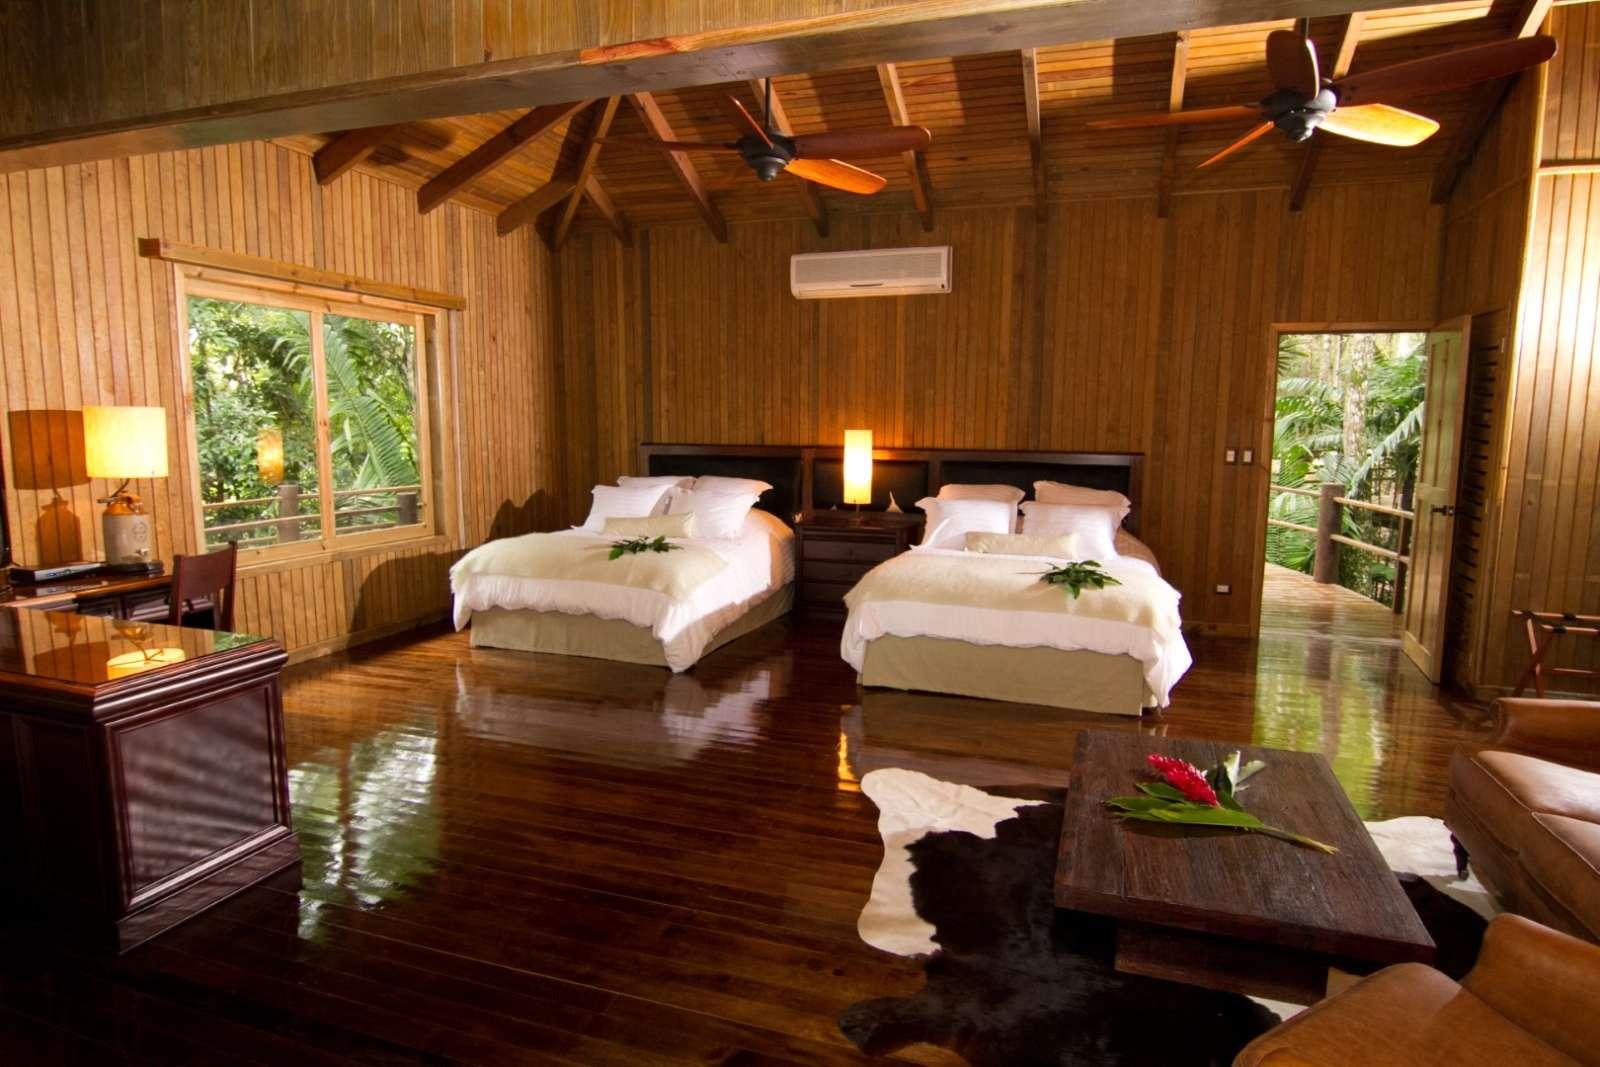 Twin room at Hotel Las Lagunas, Guatemala